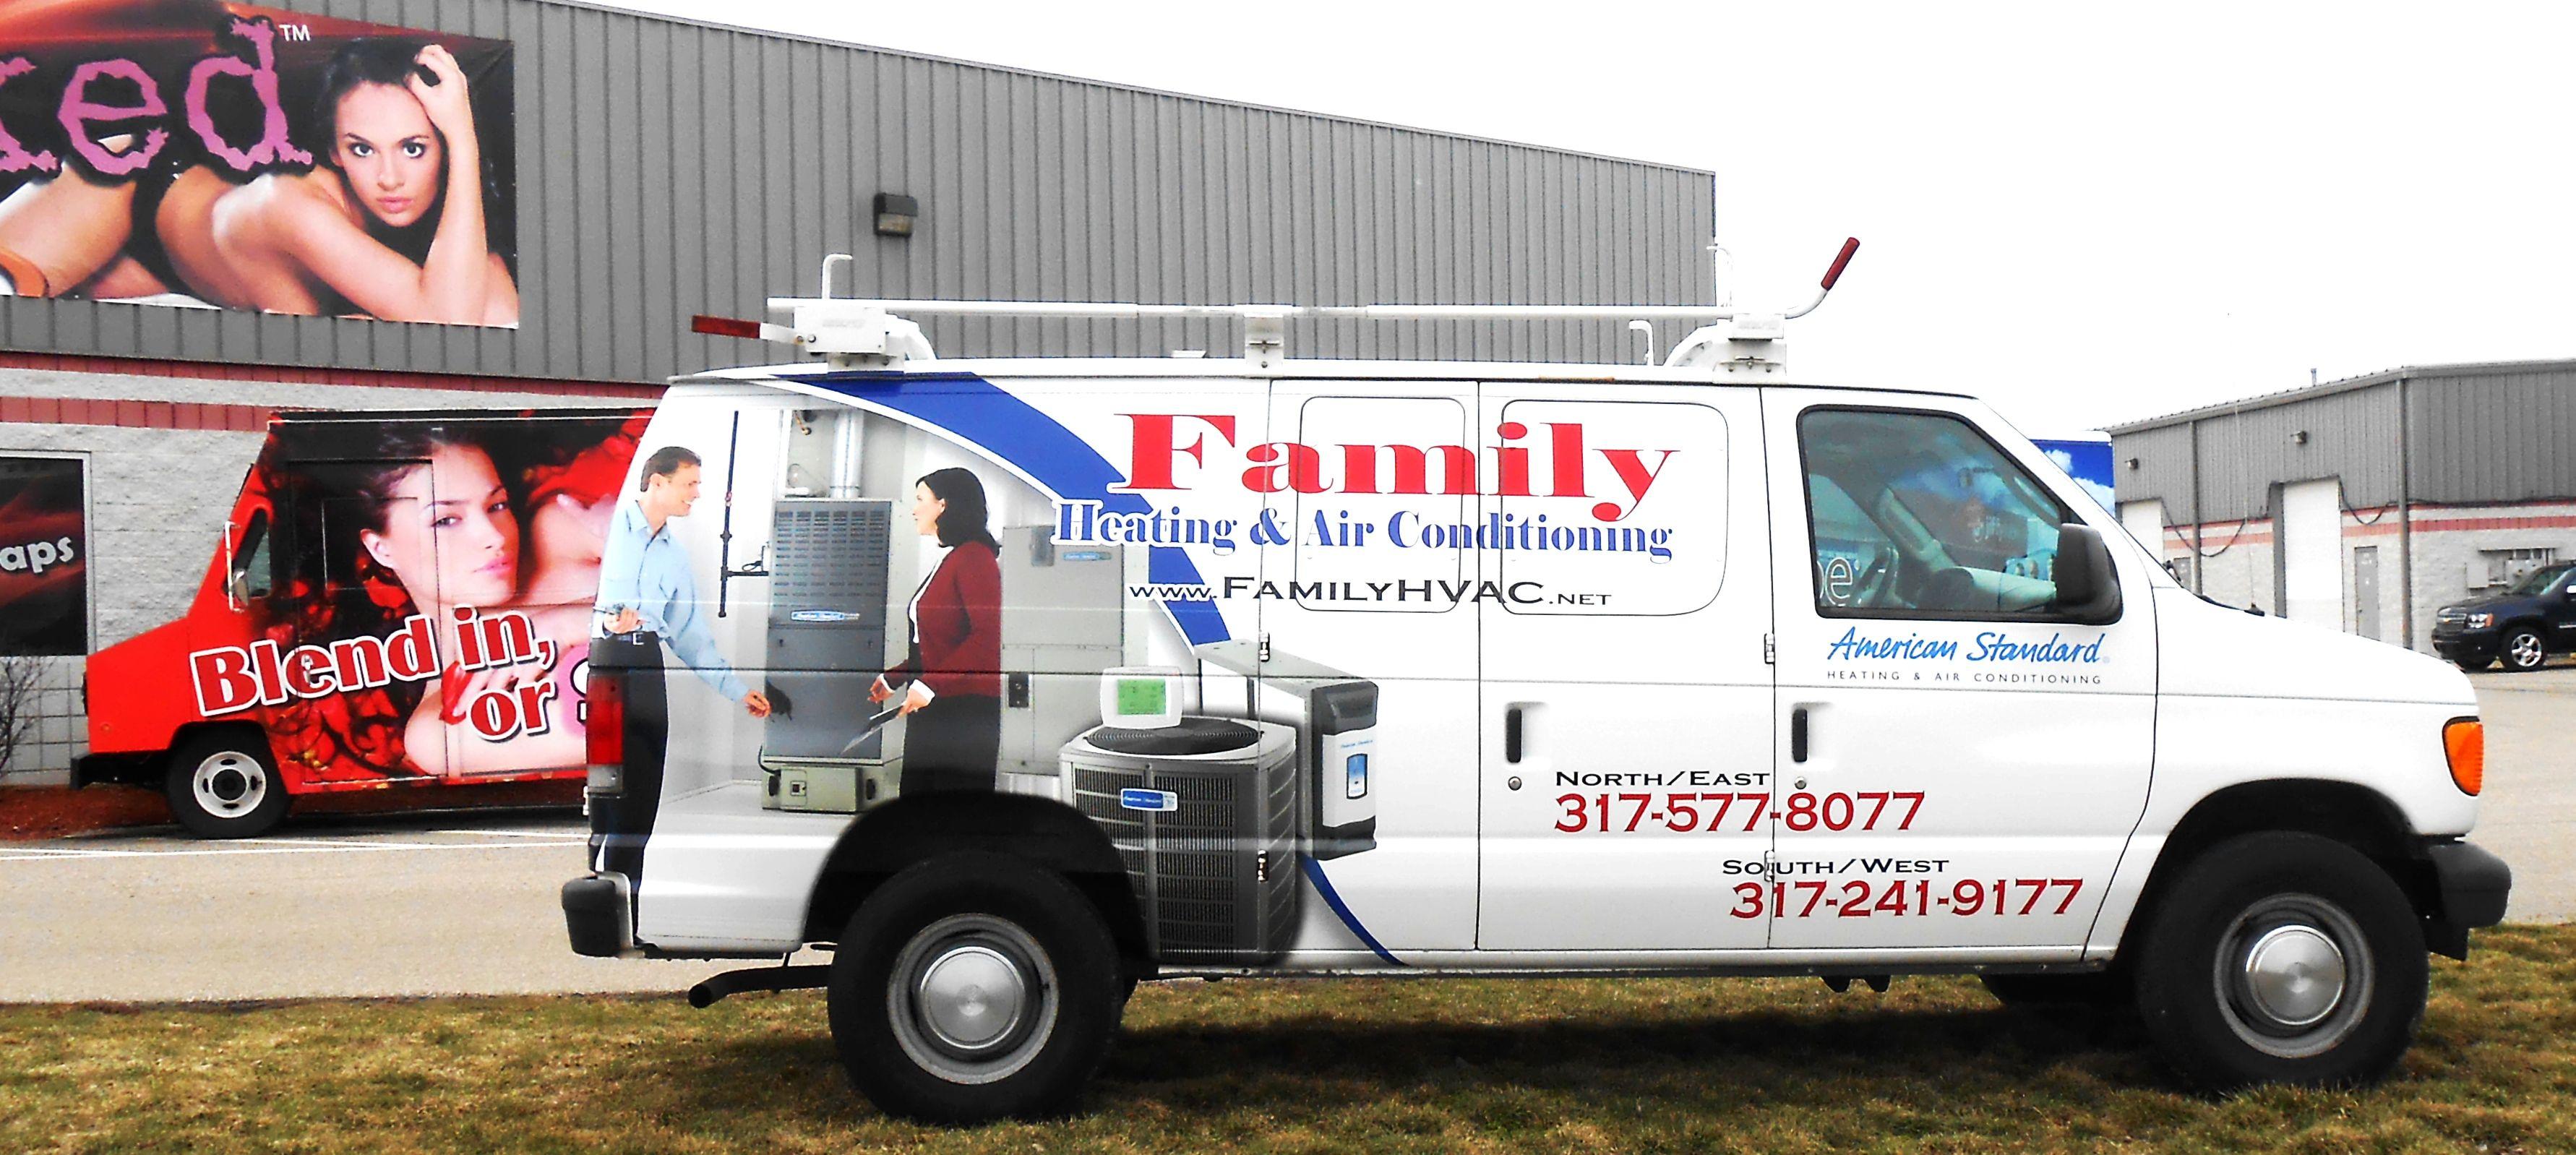 Family Heating & Air Conditioning / HVAC graphics / van